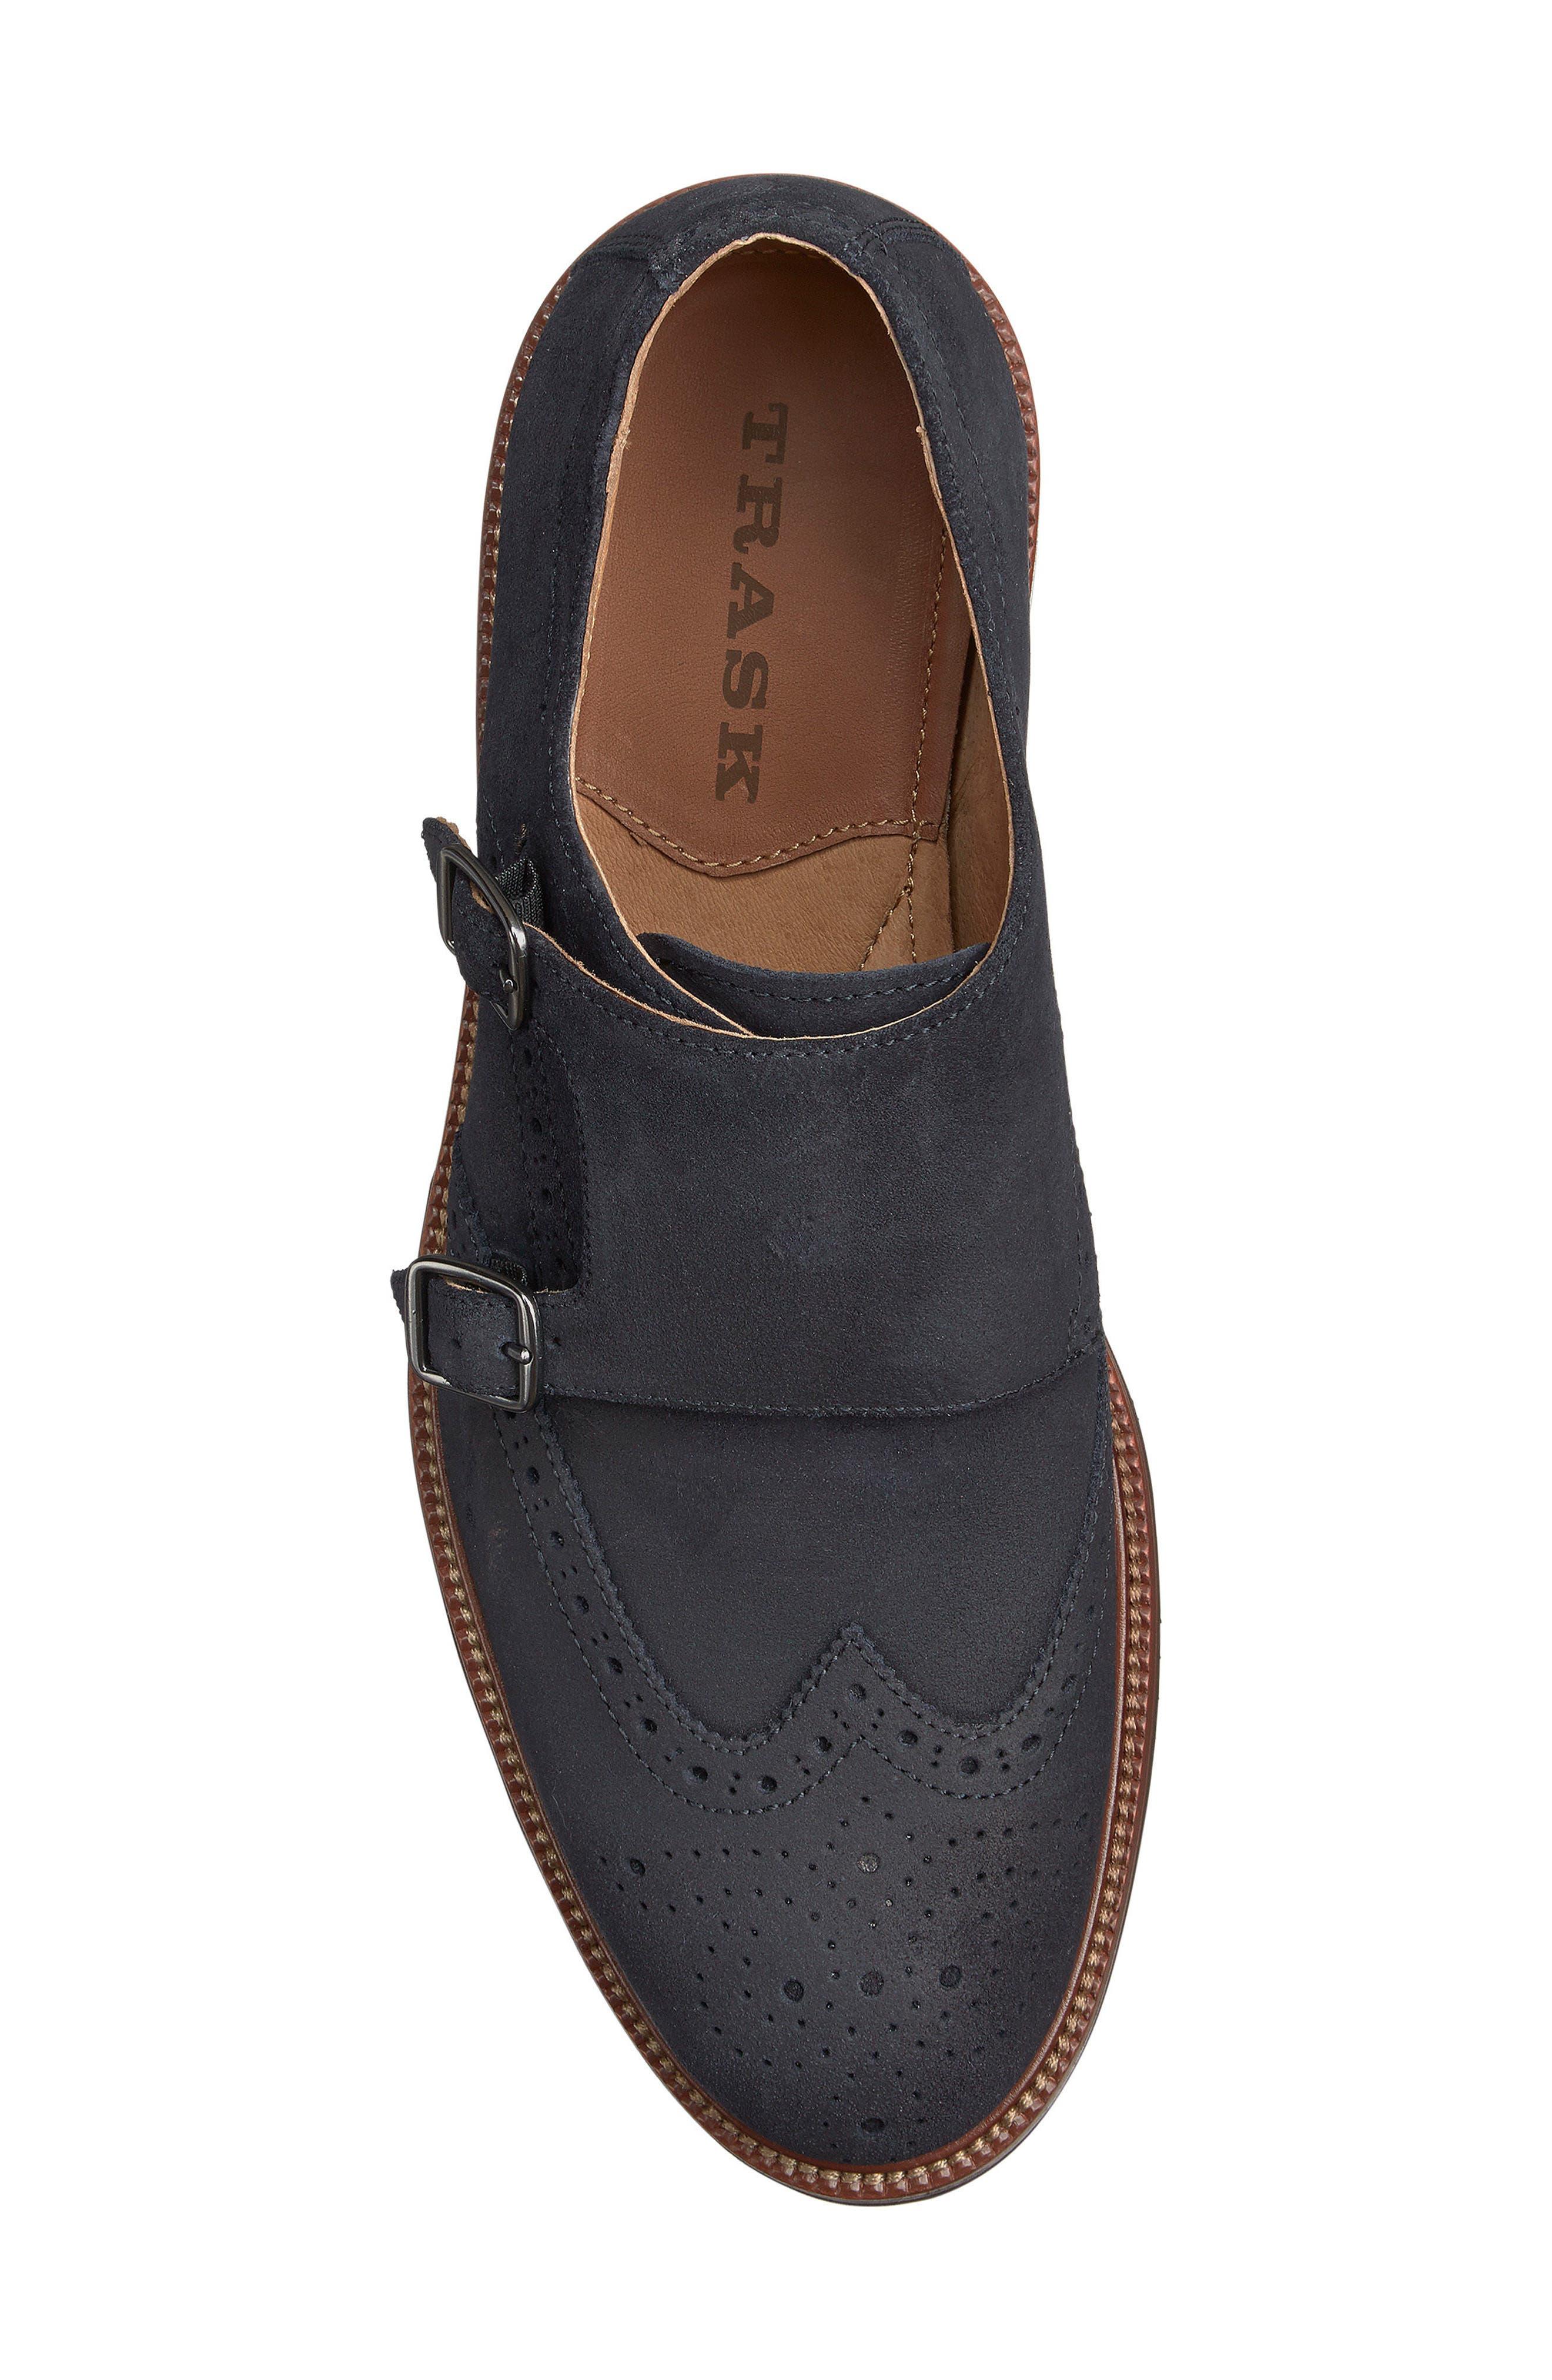 Leland Double Monk Strap Shoe,                             Alternate thumbnail 3, color,                             Navy Waxed Suede